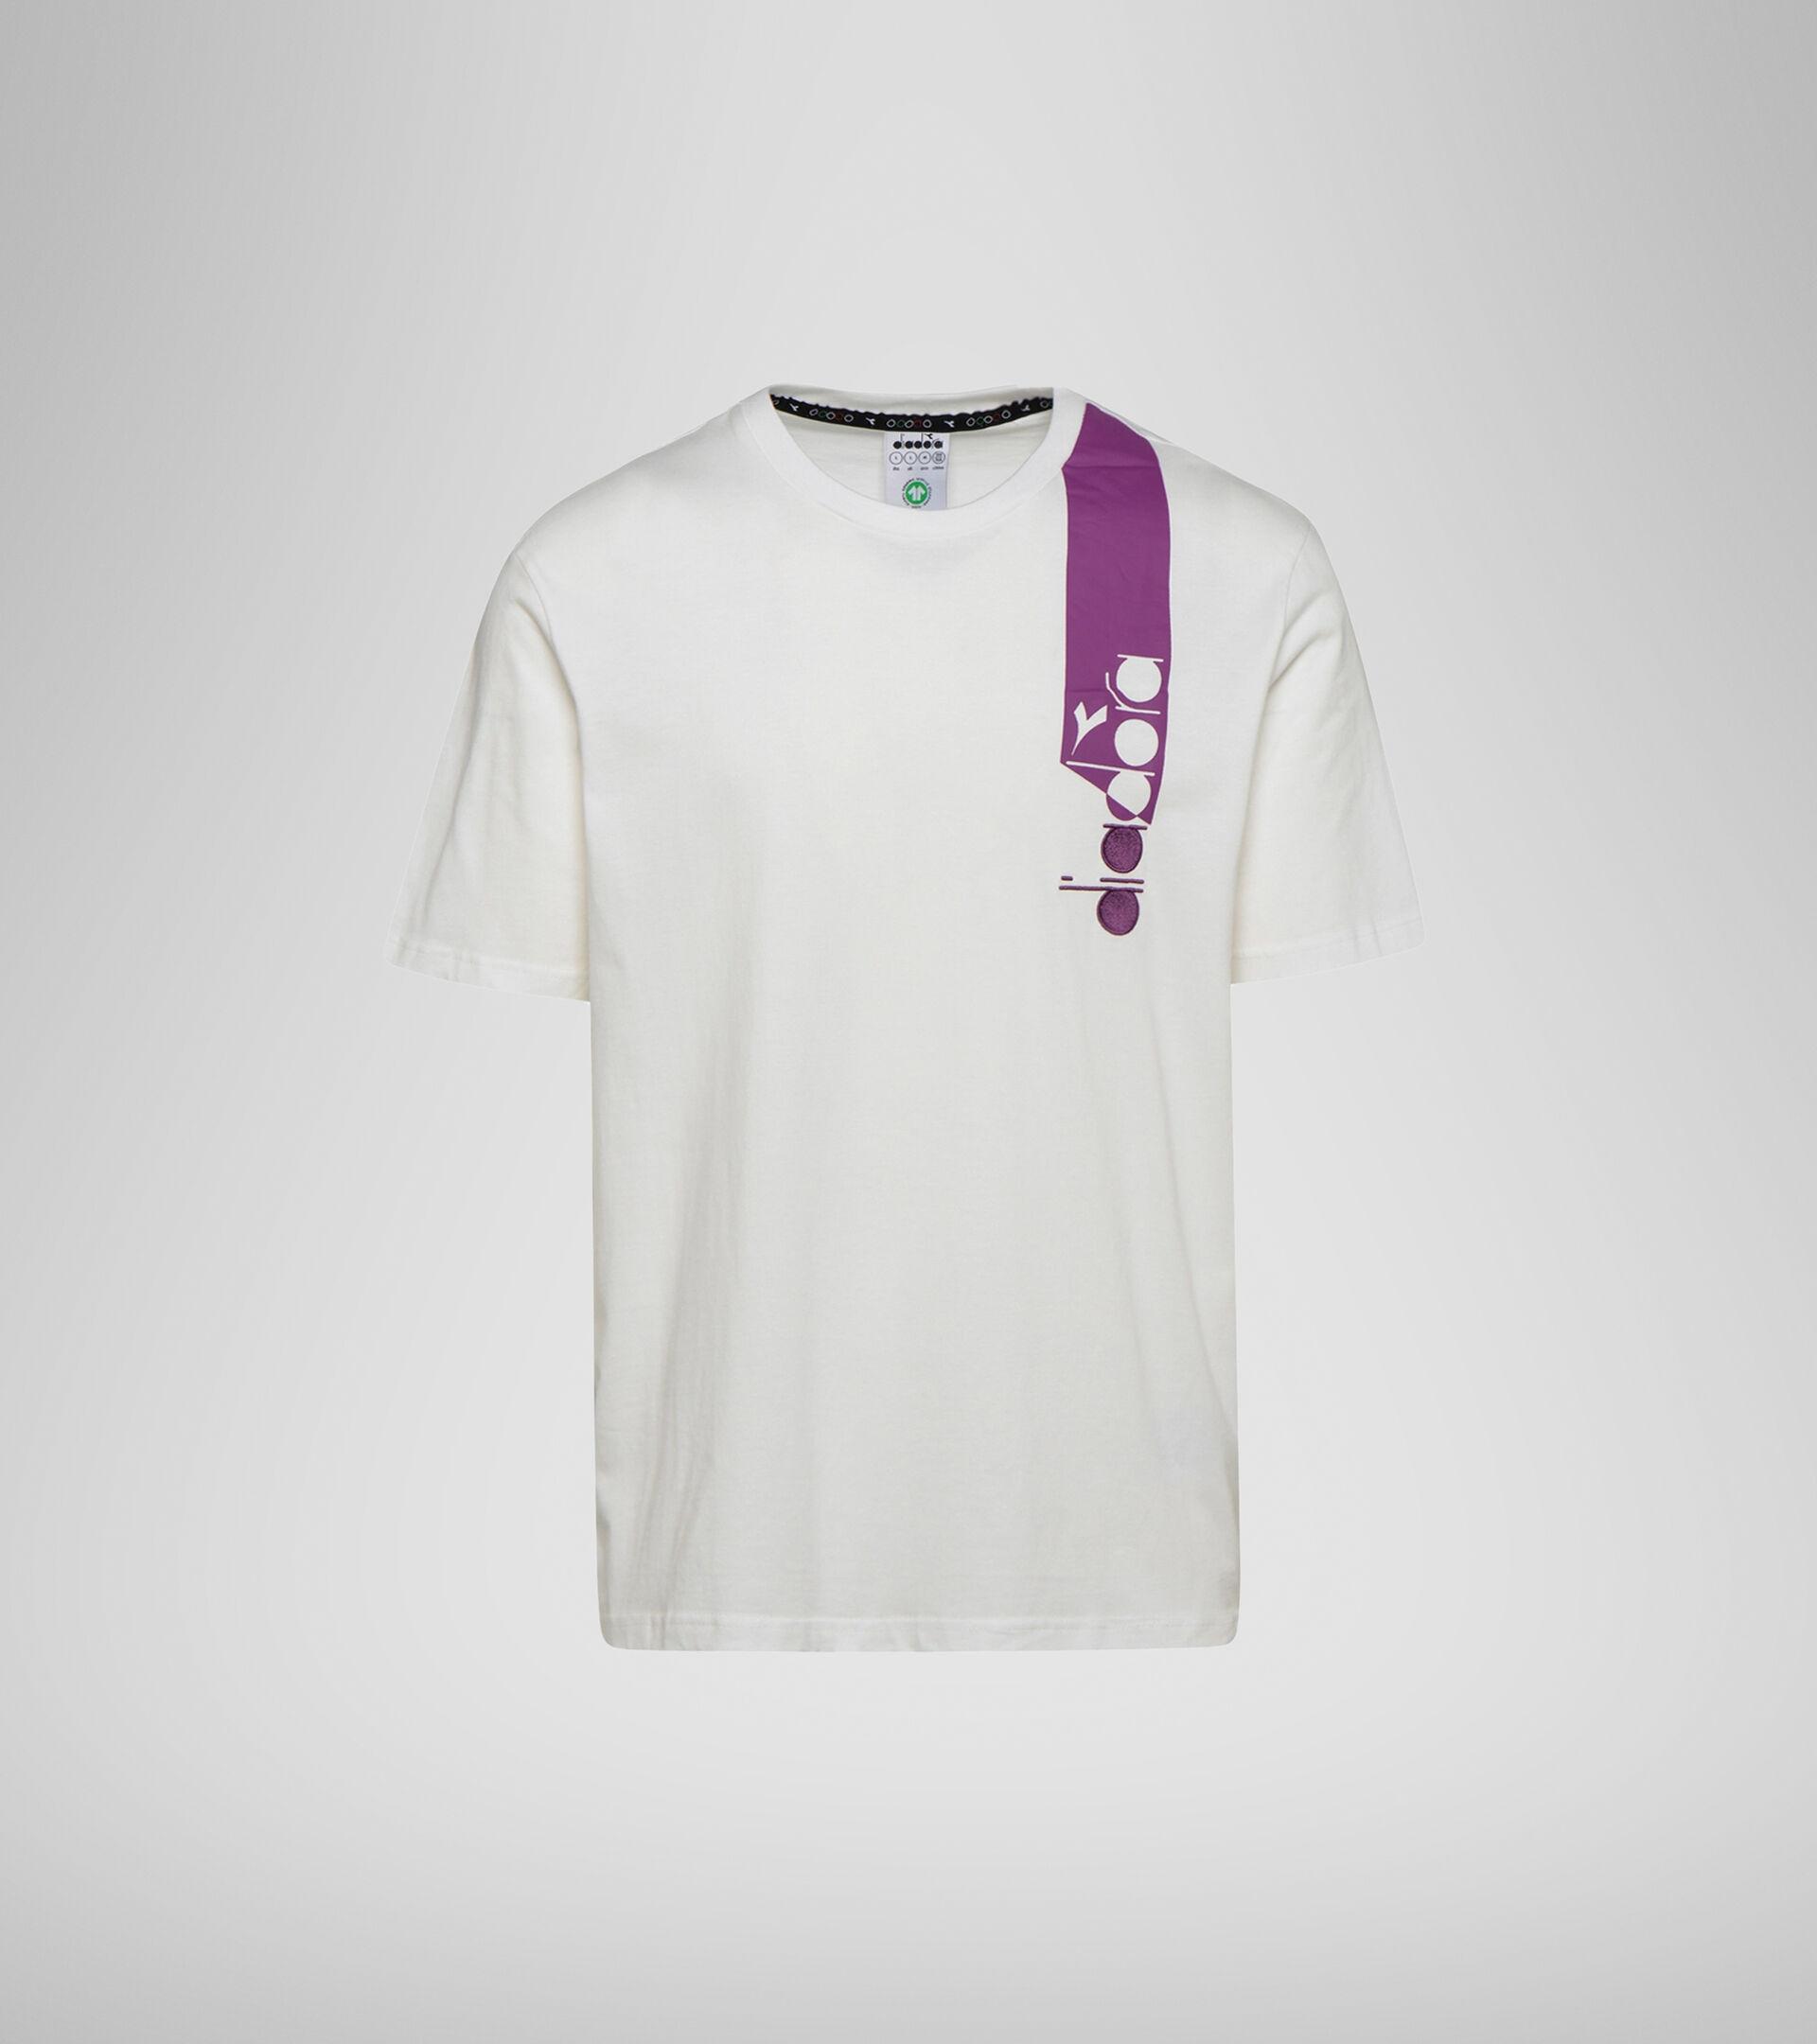 T-shirt - Unisex T-SHIRT SS ICON SPARKLING GRAPE/BLC DE BLC/BLK - Diadora